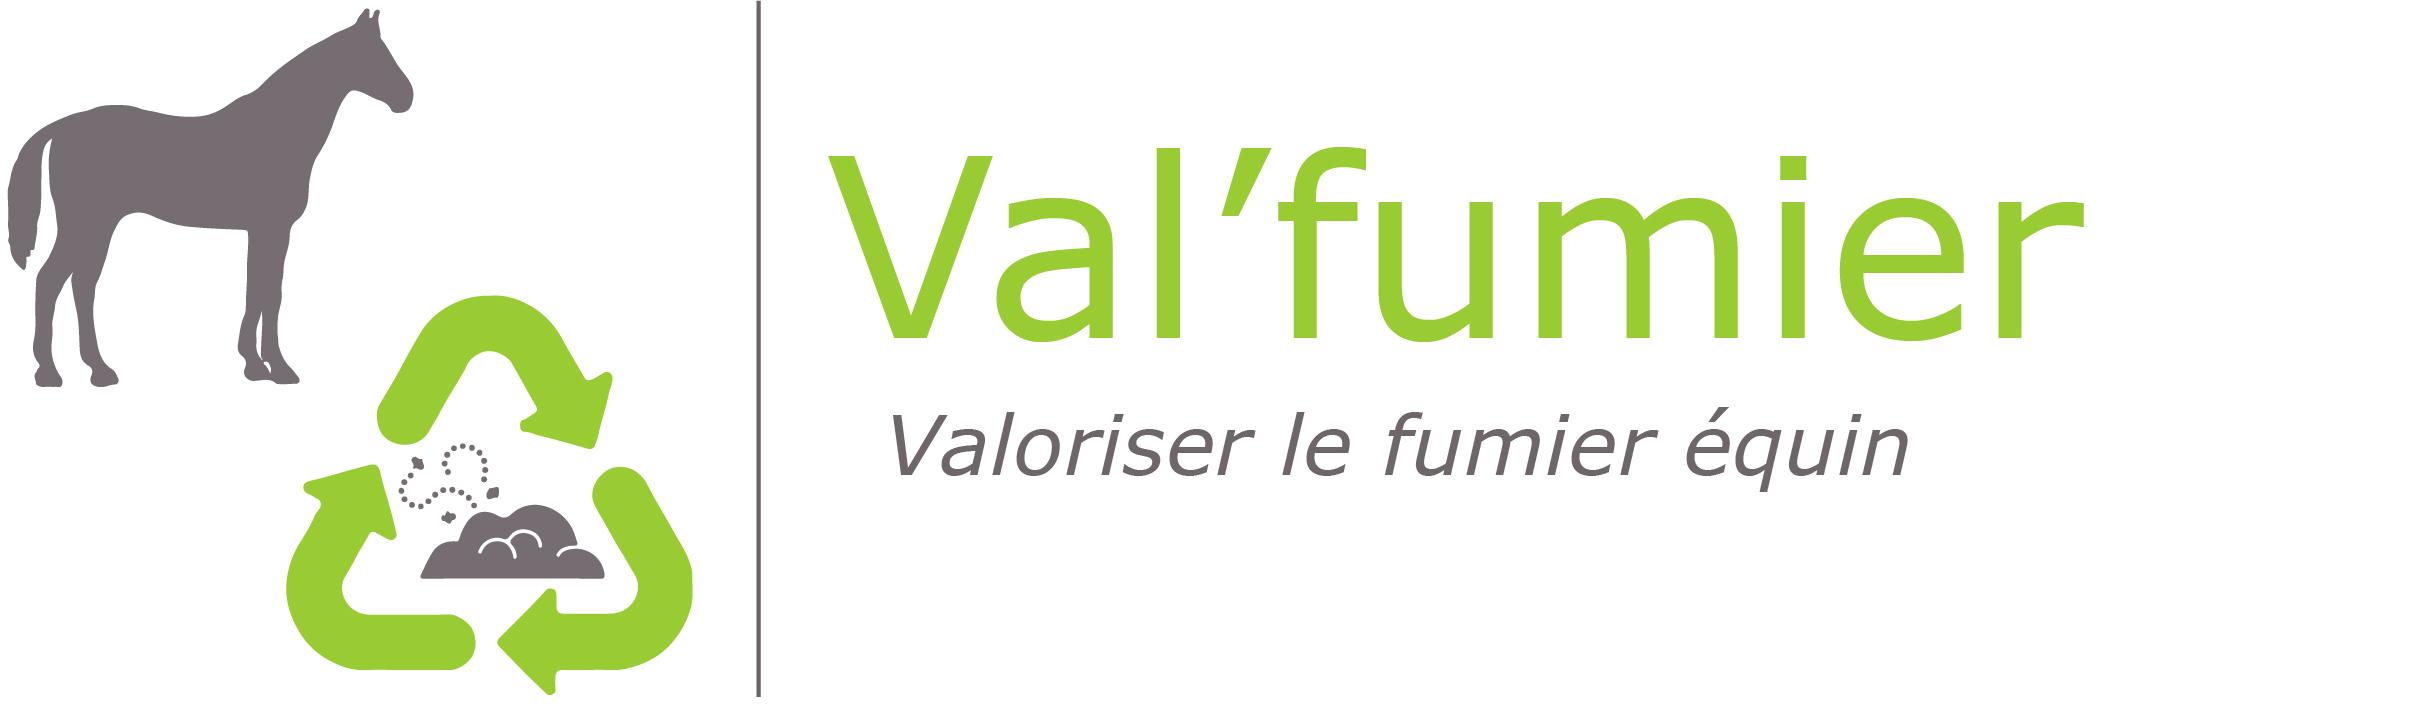 Le logo Valfumier